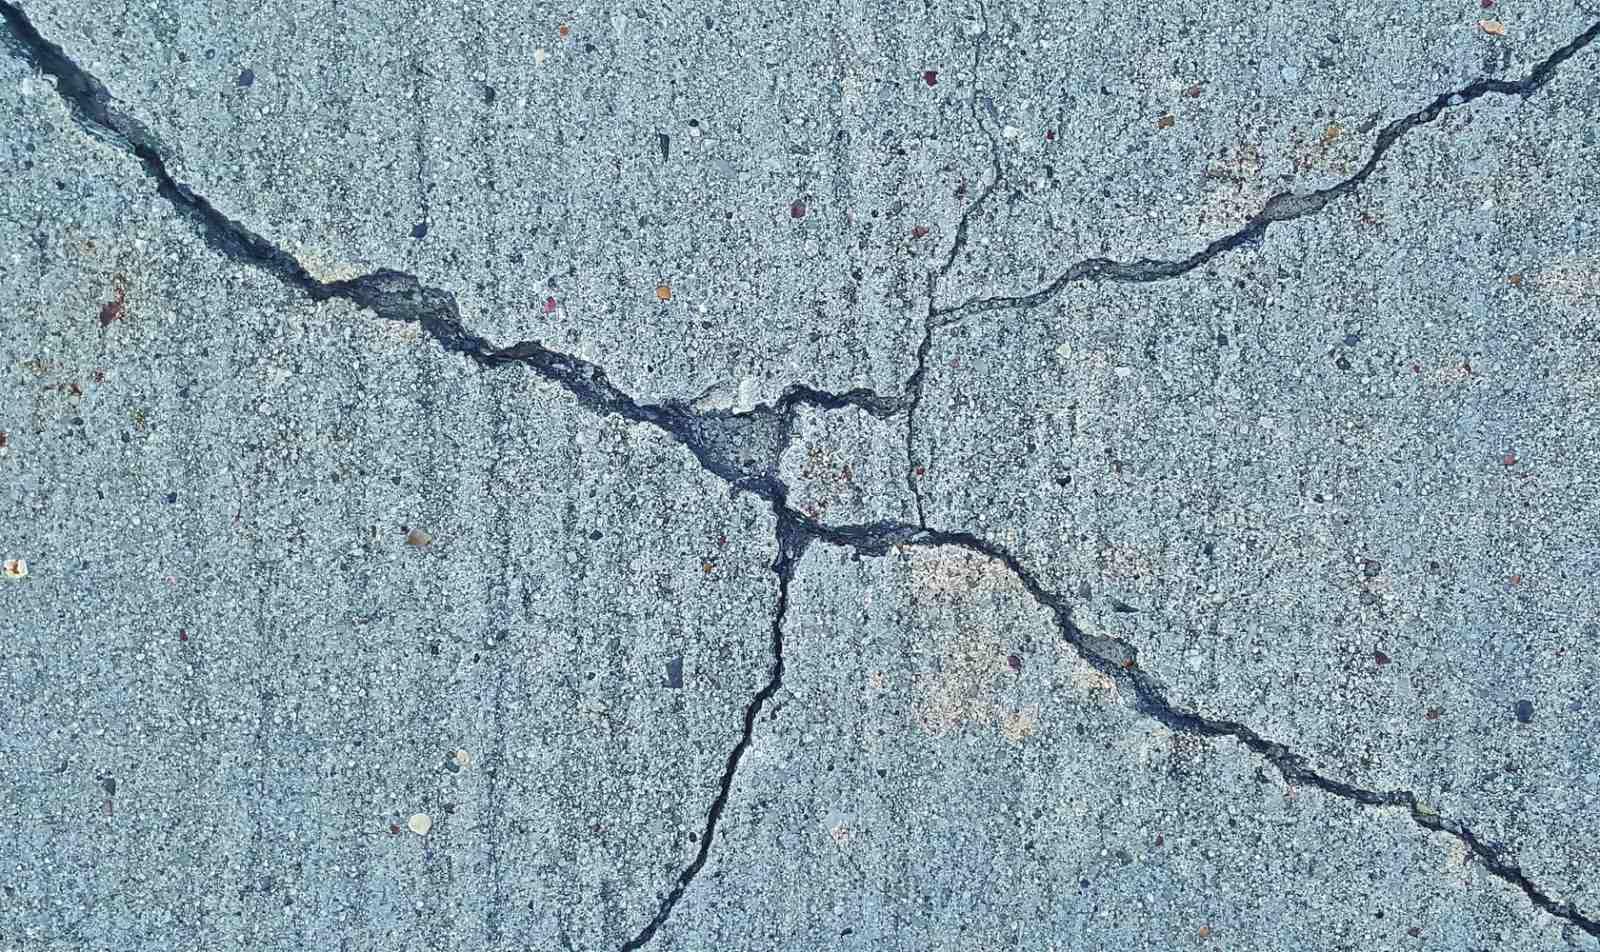 Earthquakes & Tsunamis in Tonga